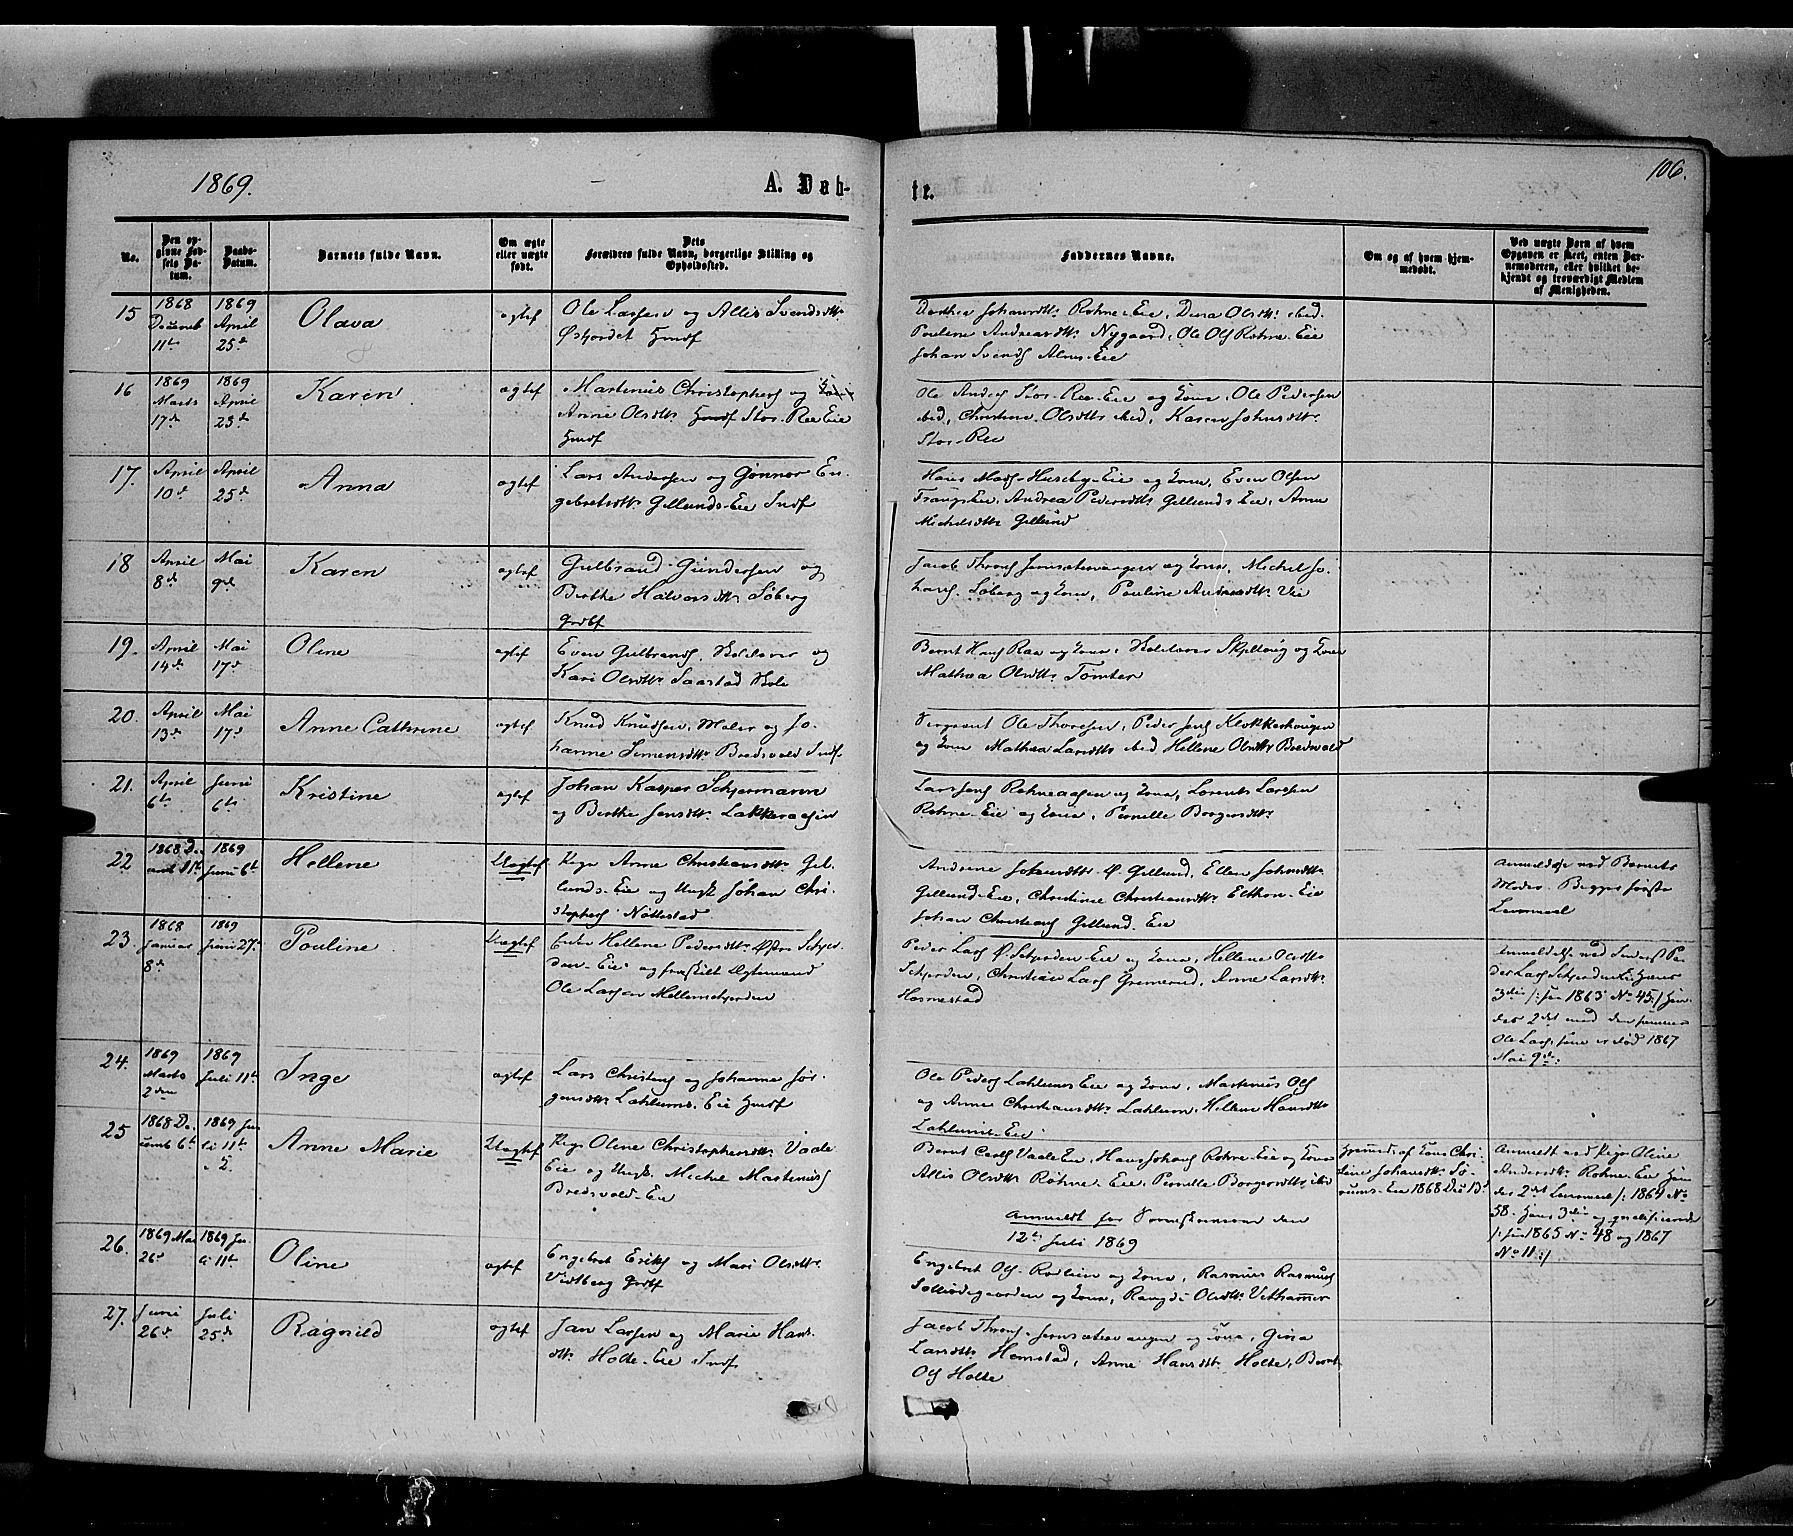 SAH, Stange prestekontor, K/L0013: Ministerialbok nr. 13, 1862-1879, s. 106